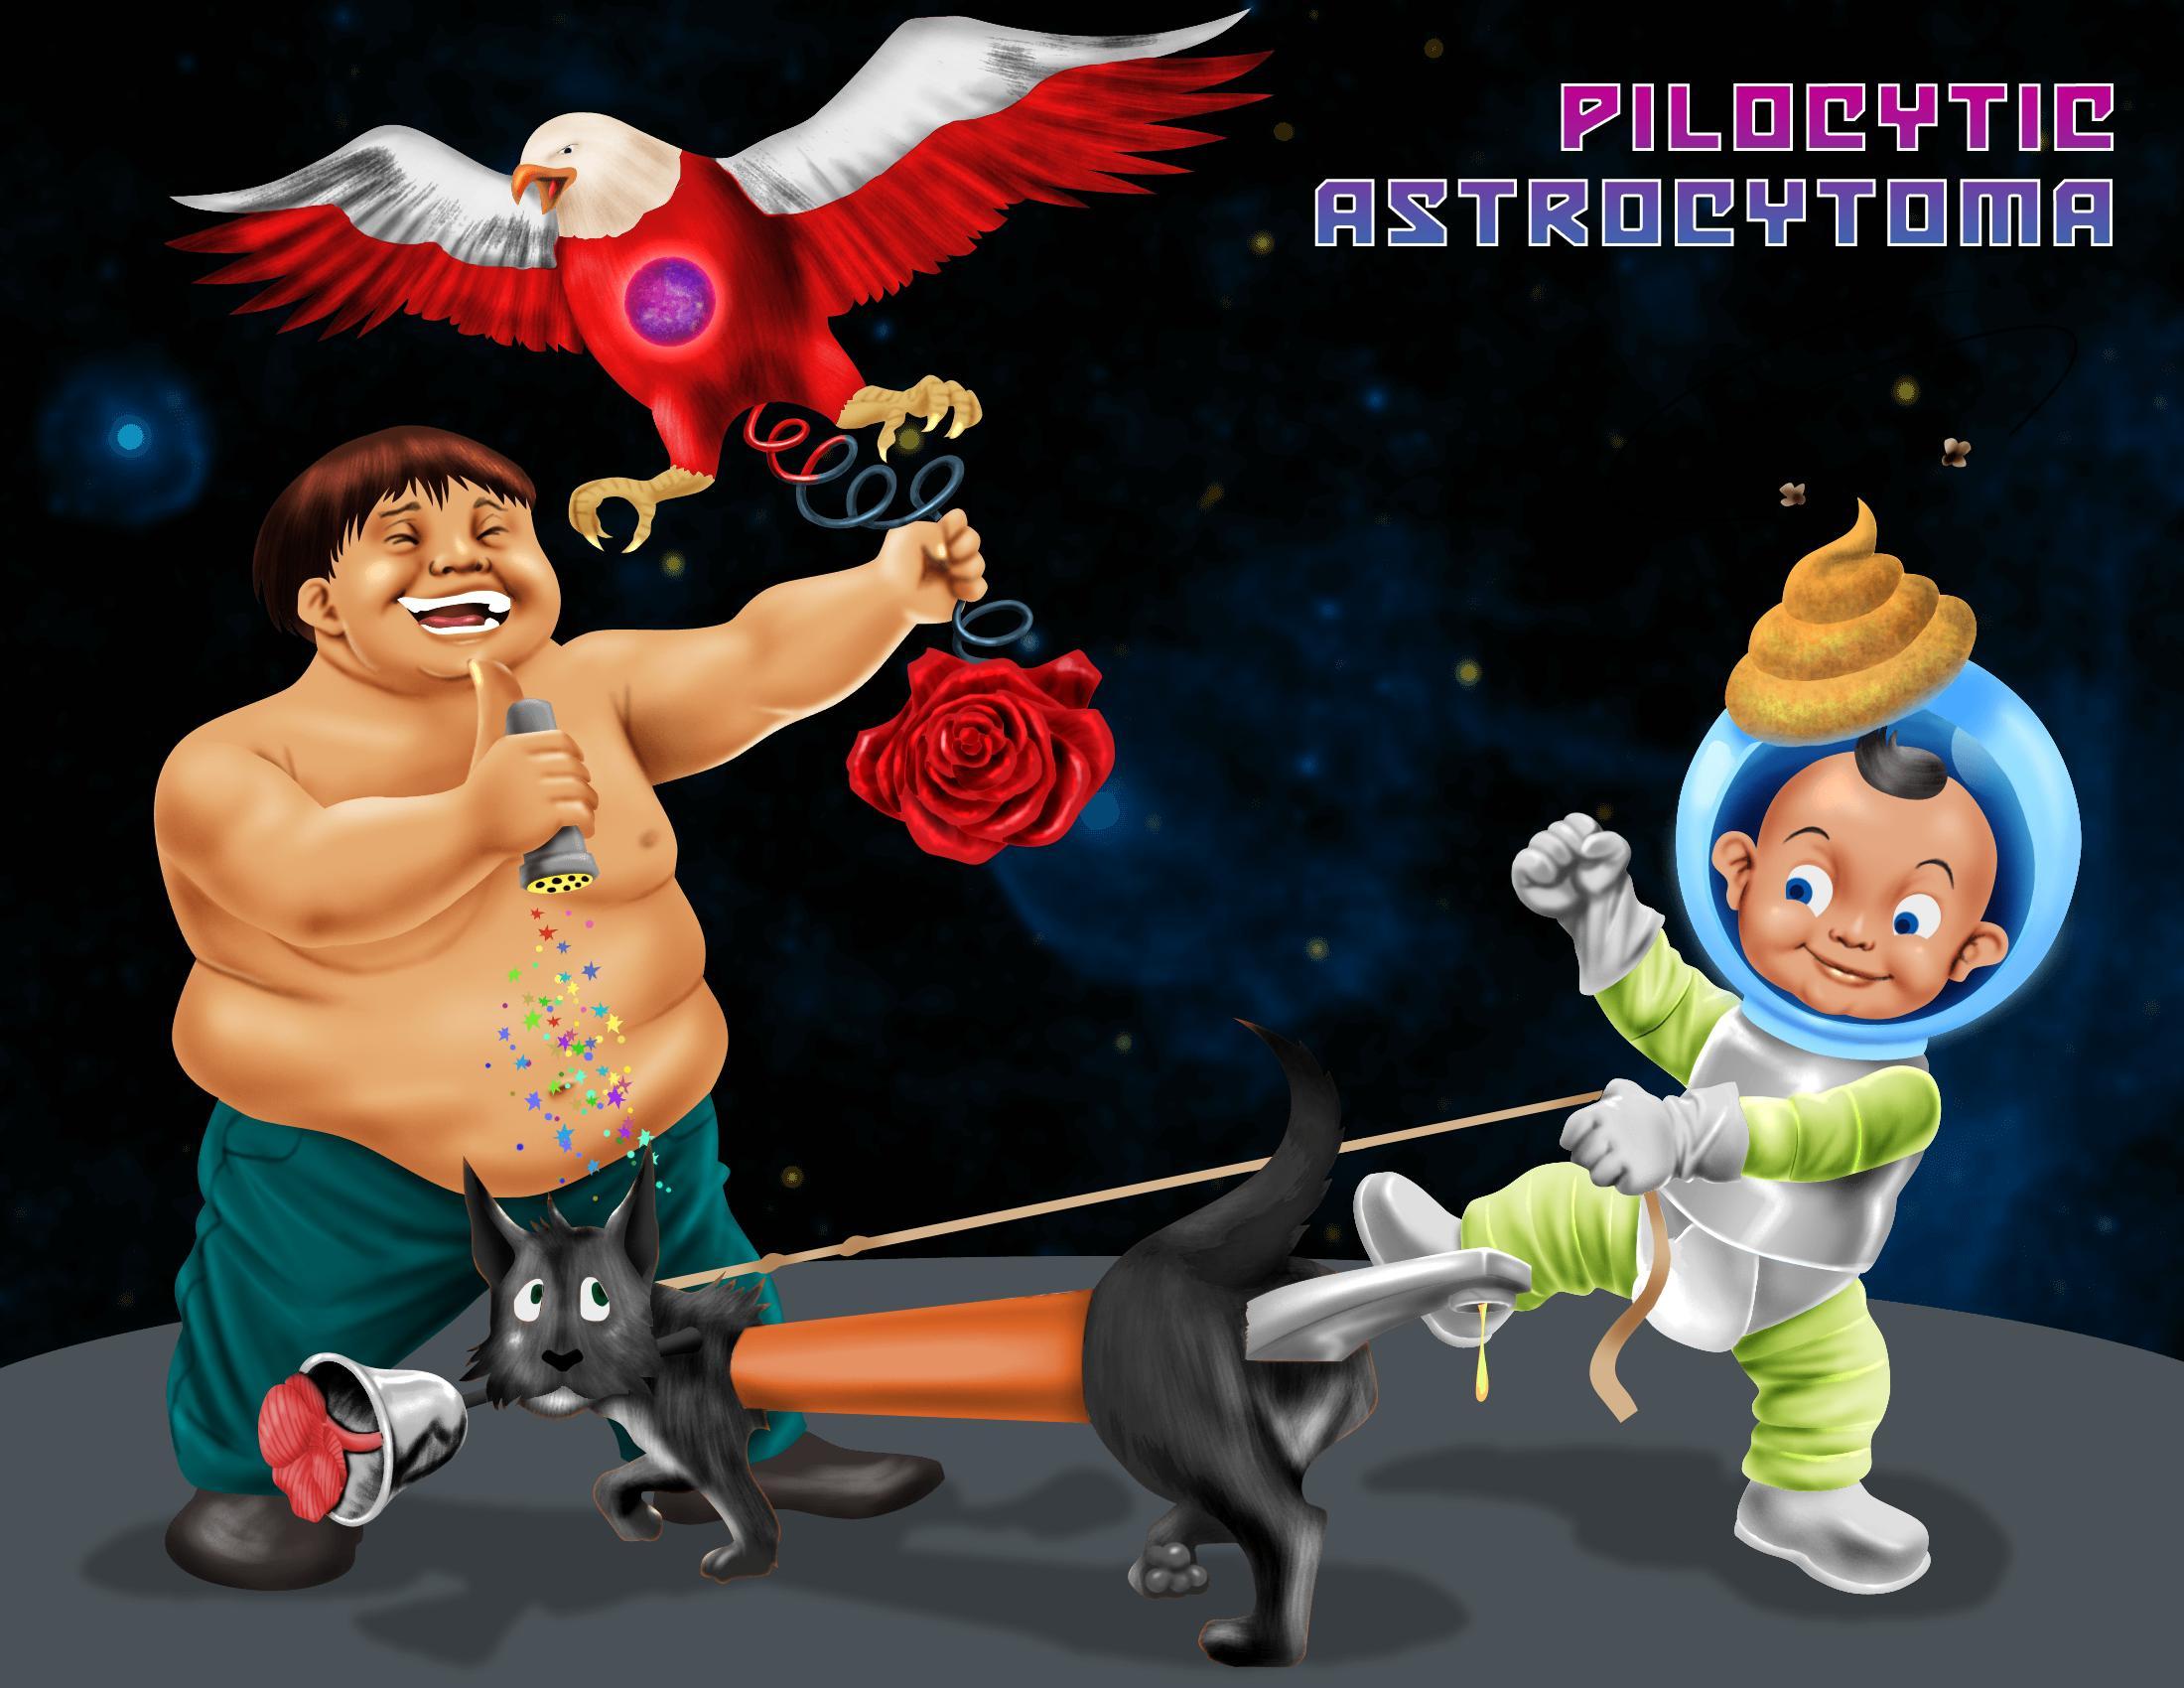 Pilocytic Astrocytoma